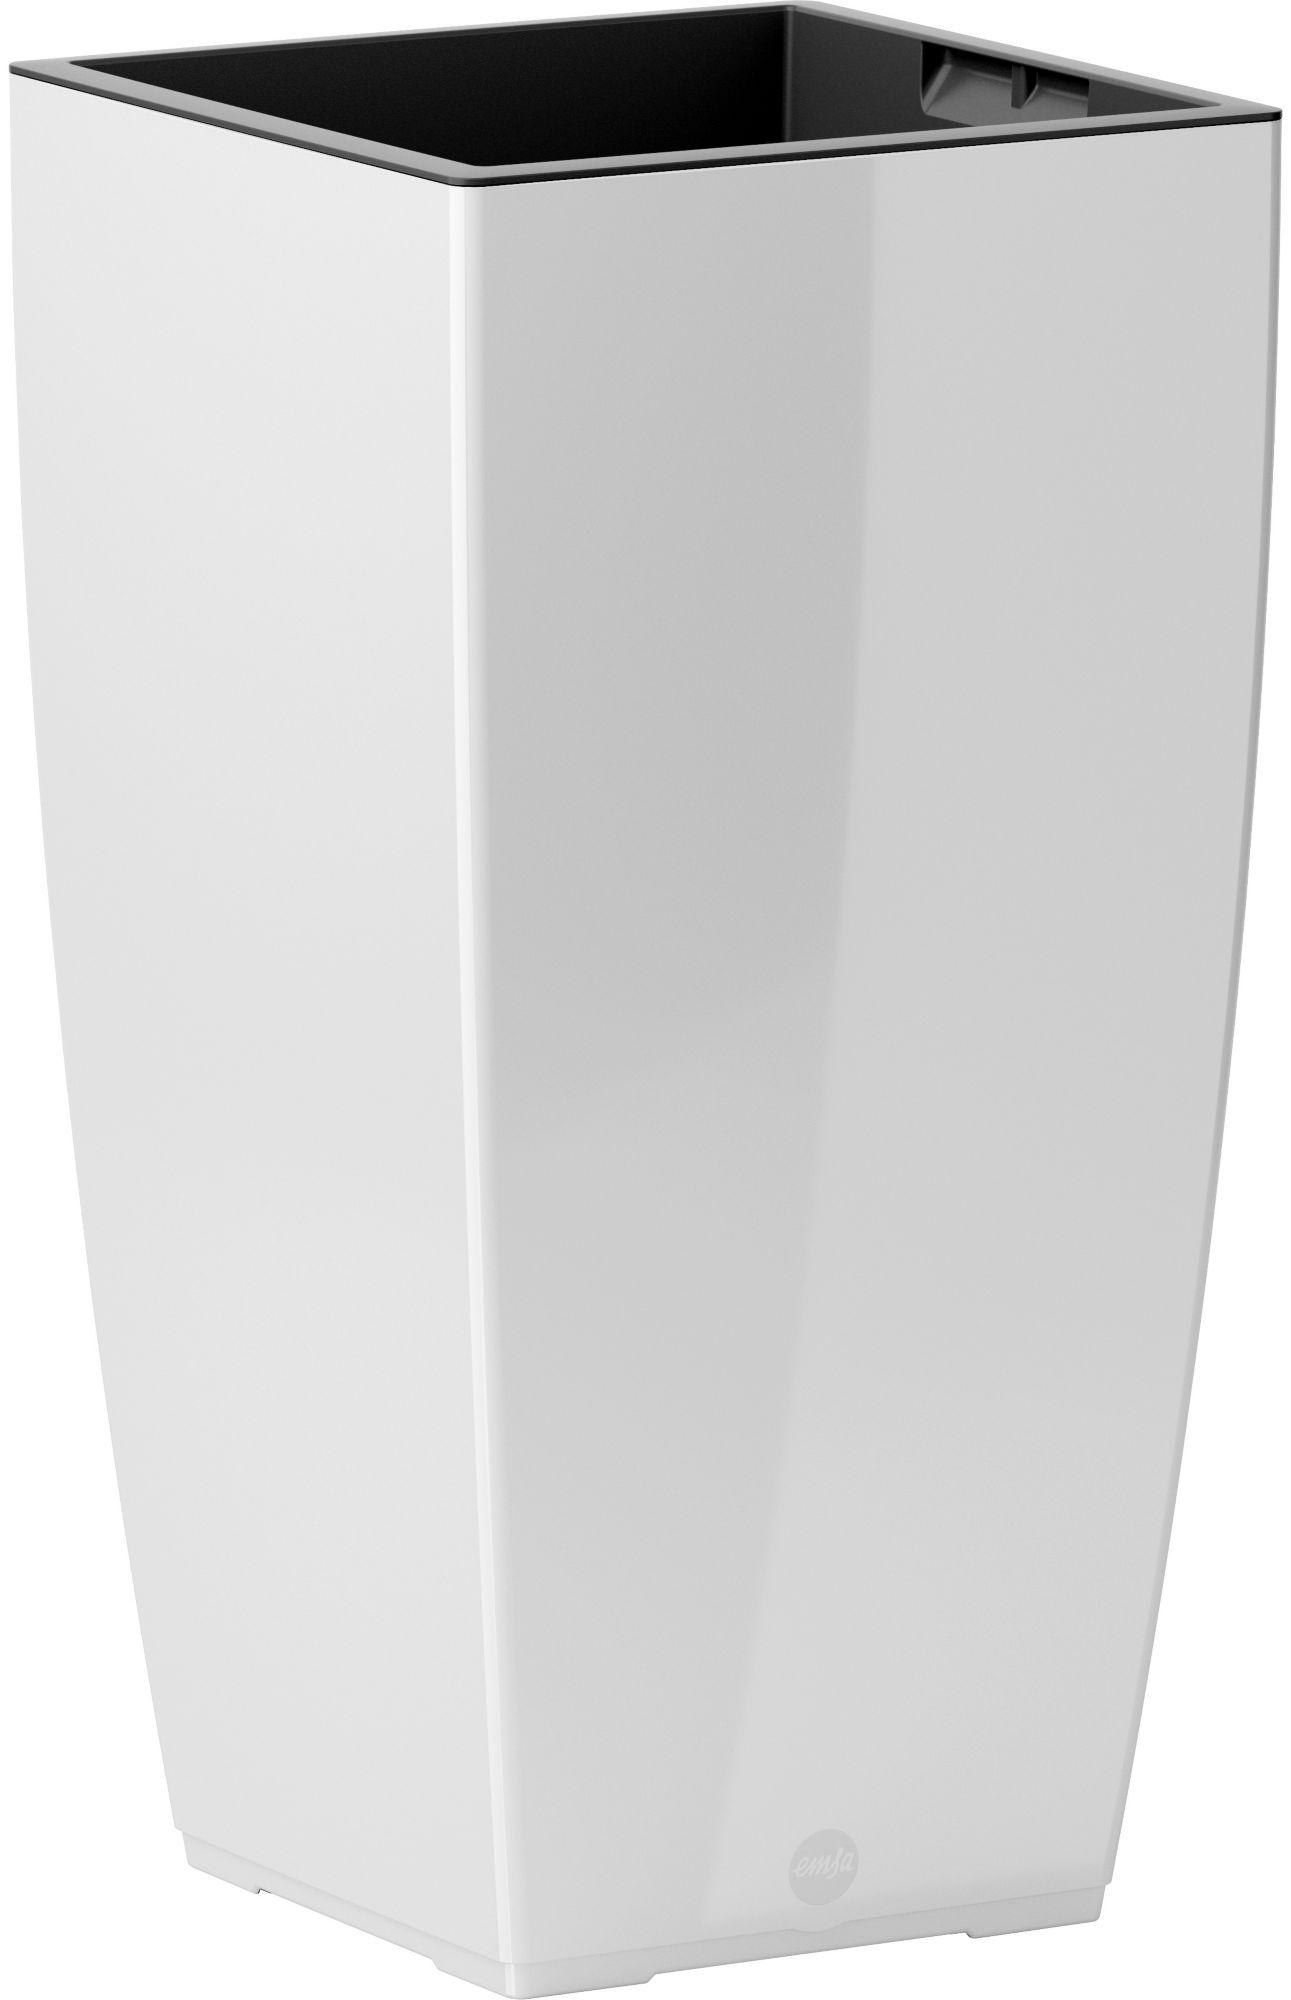 EMSA Emsa Blumenkasten »CASA Brilliant Säule«, BxTxH: 30x30x57 cm, weiß